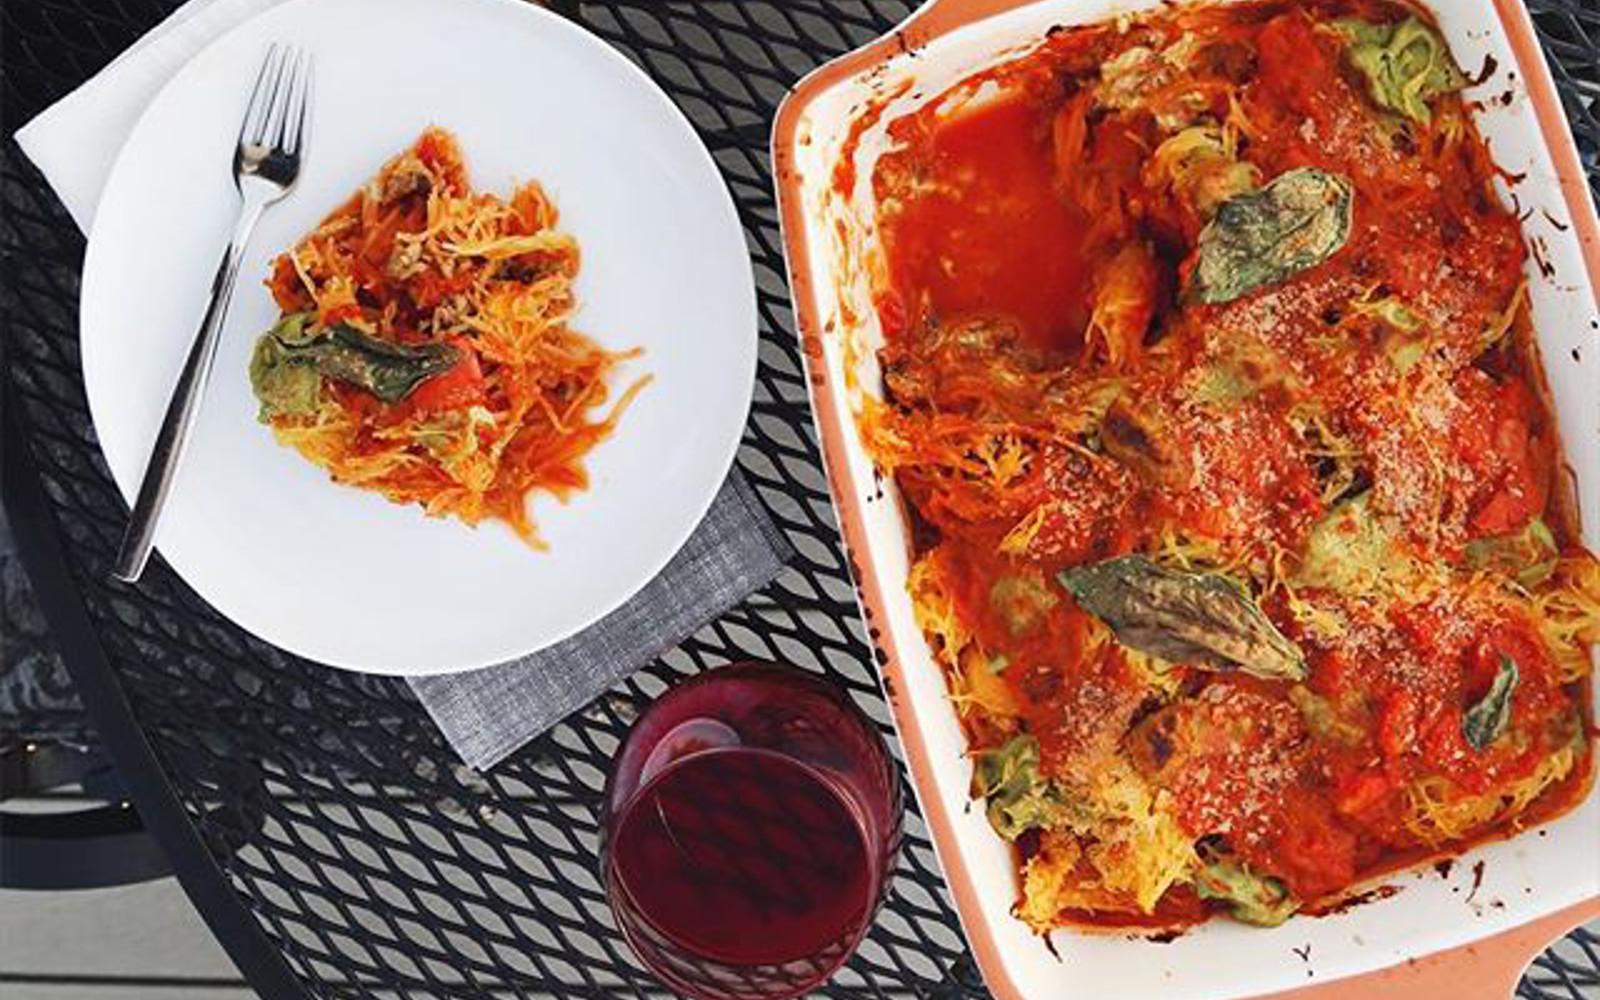 Fire Roasted Tomato Basil Spaghetti Squash Bake b